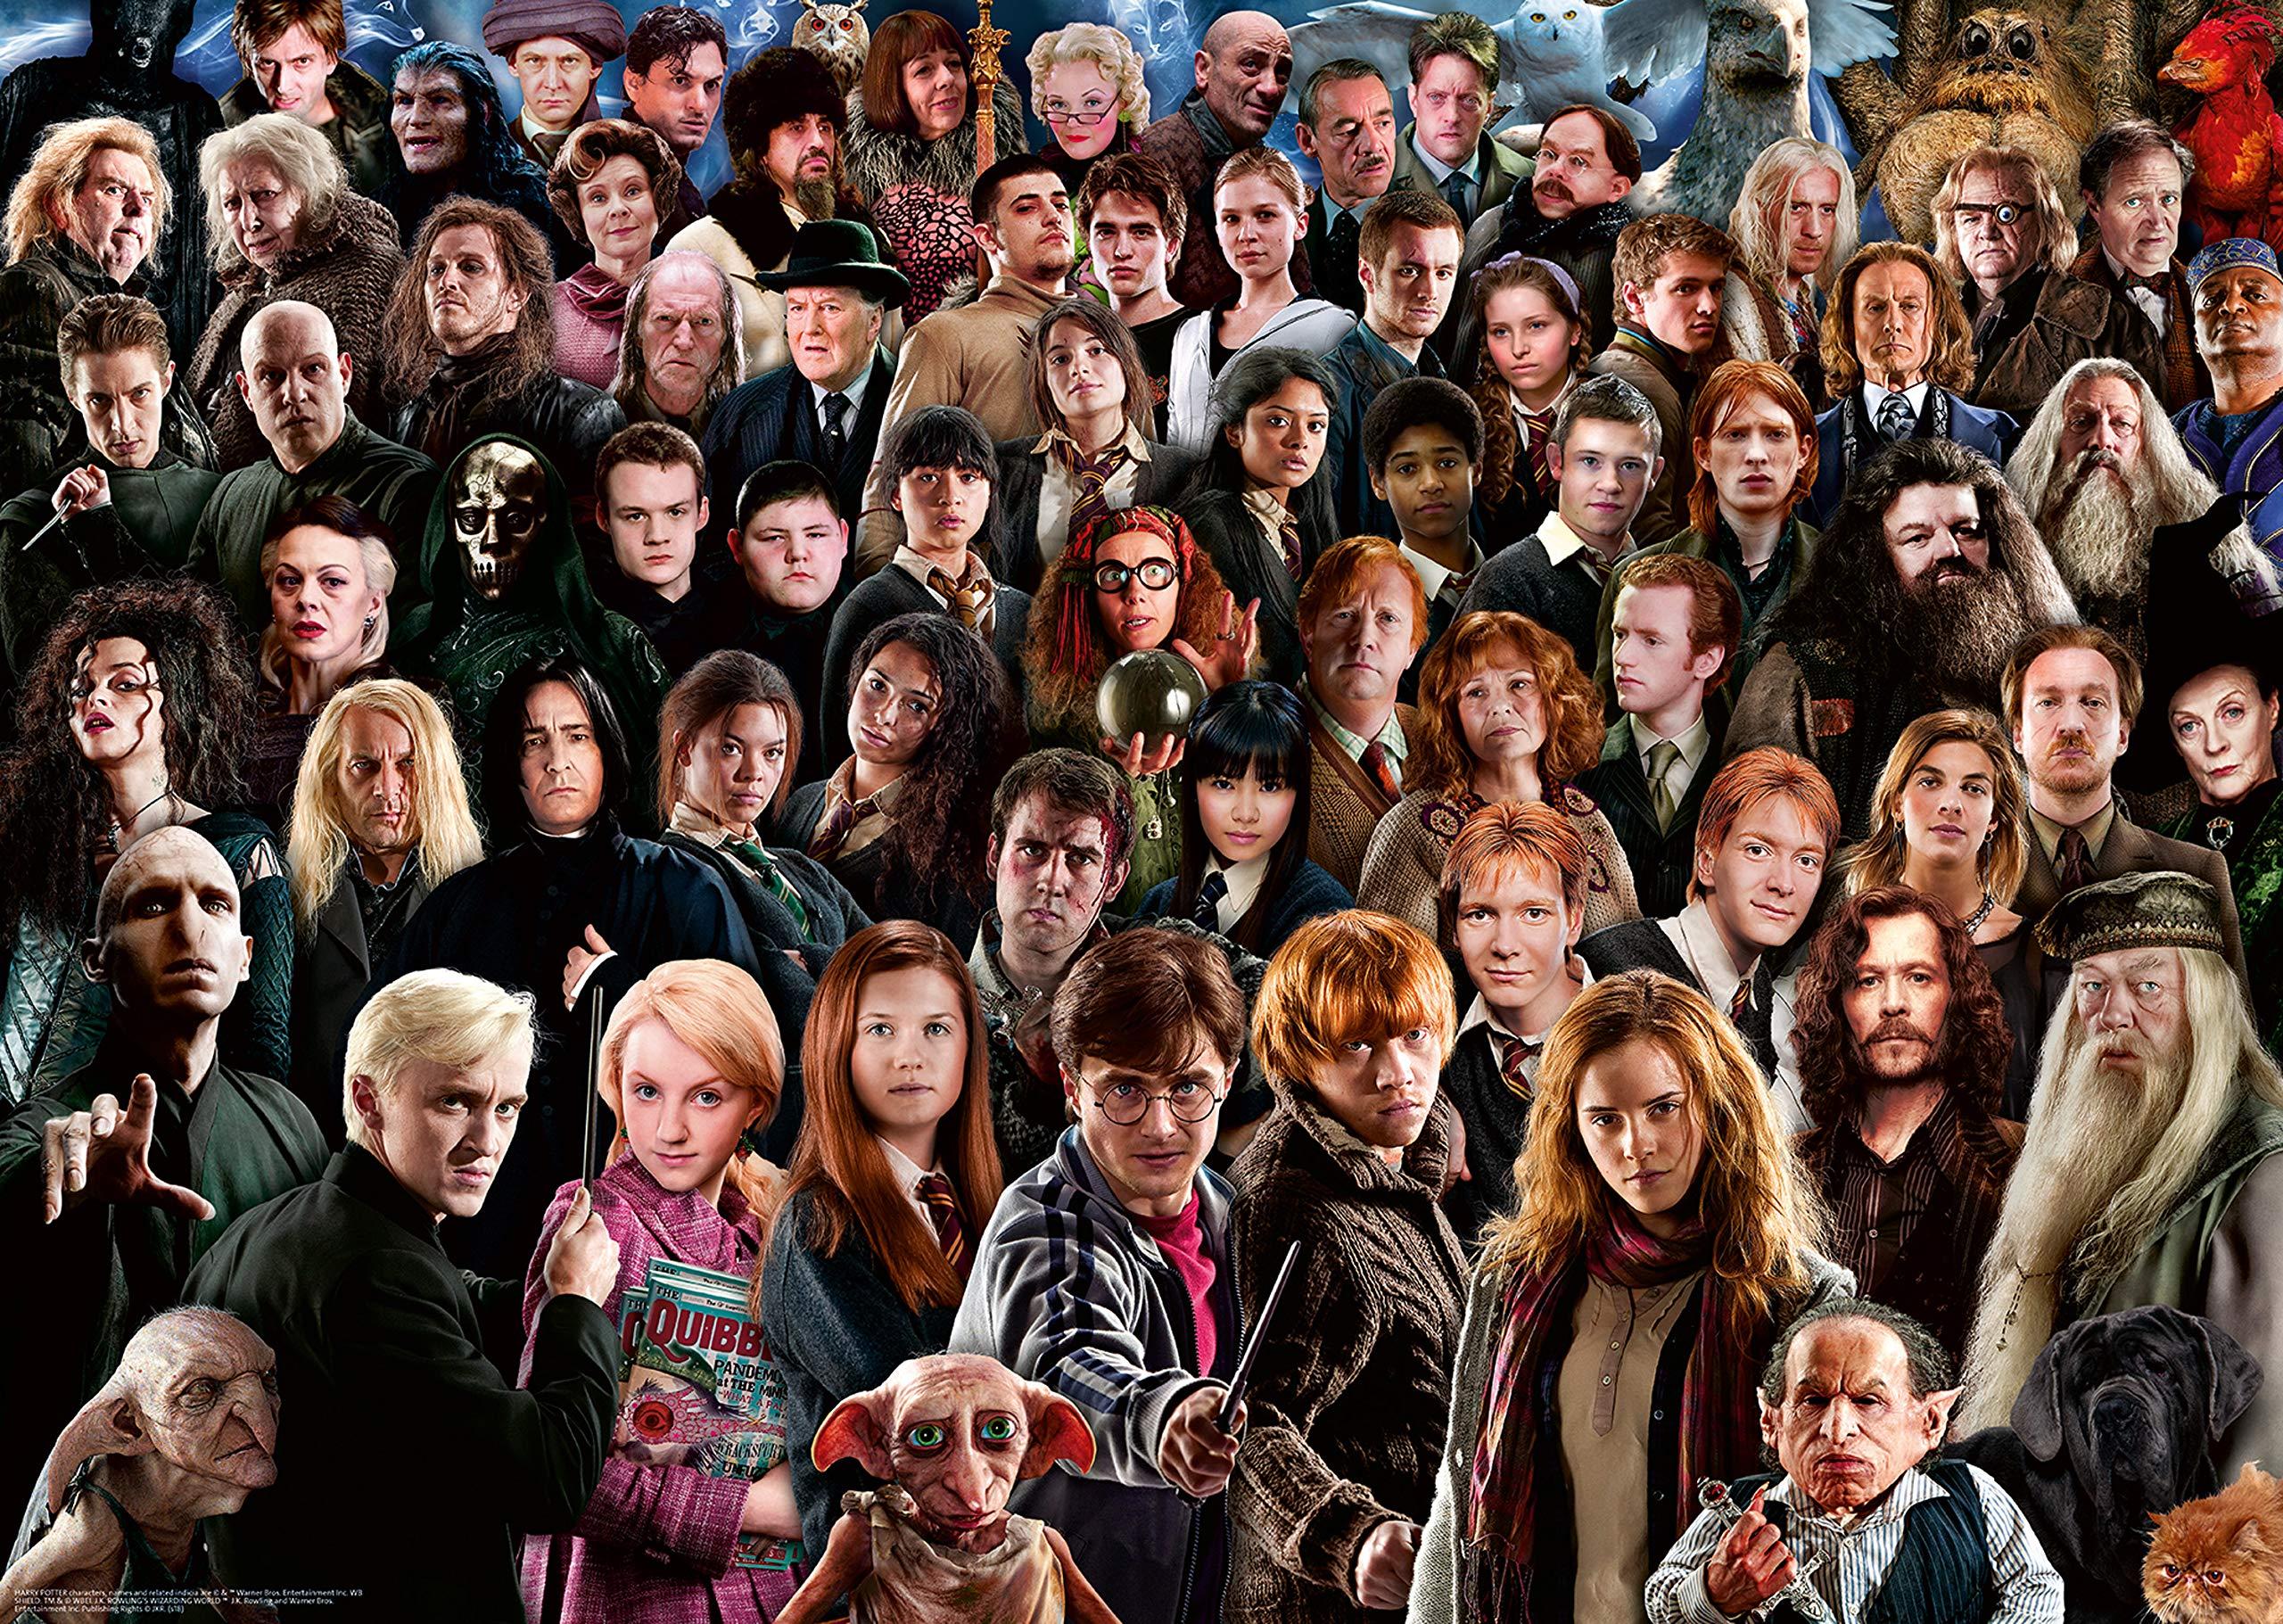 Ravensburger-14988-Harry-Potter-Challenge-Puzzle-1000-Teile-Mehrfarbig